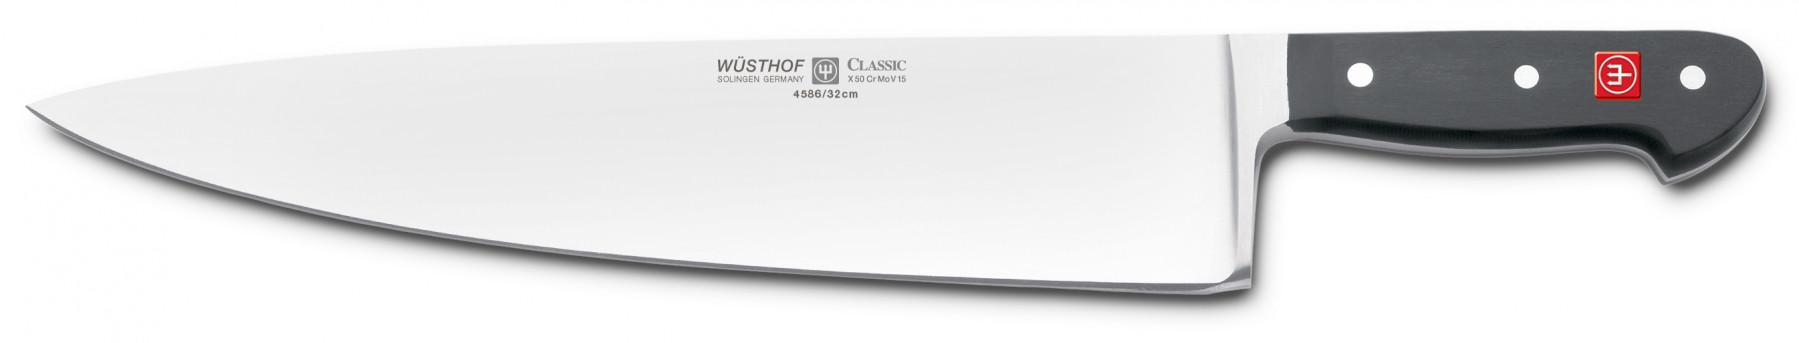 Wüsthof Dreizack Classic Kochmesser extraschwer 32cm